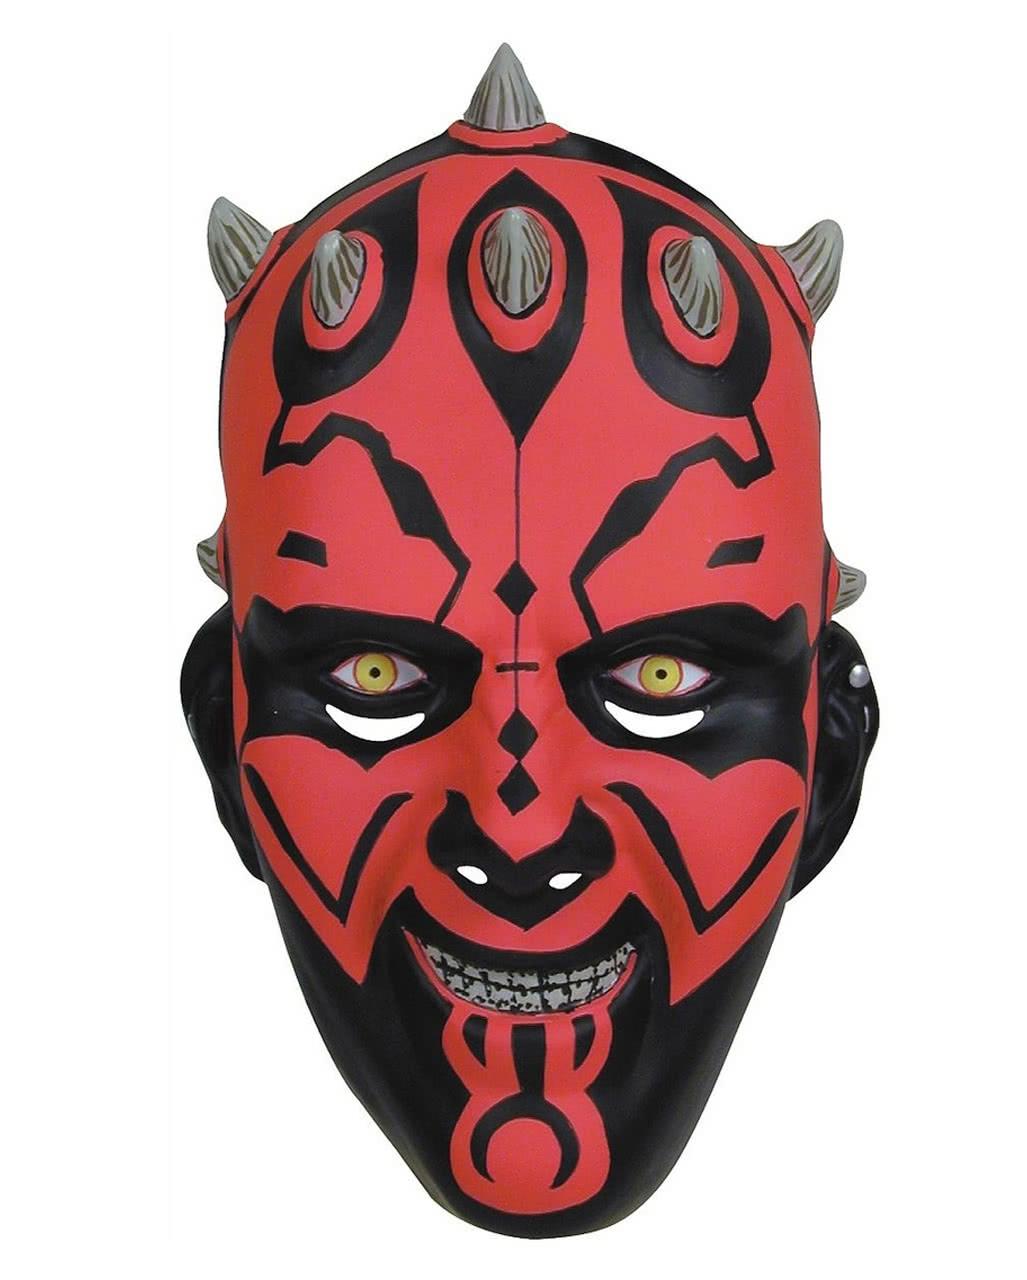 Darth Maul PVC Maske Star Wars Masken kaufen   Karneval Universe